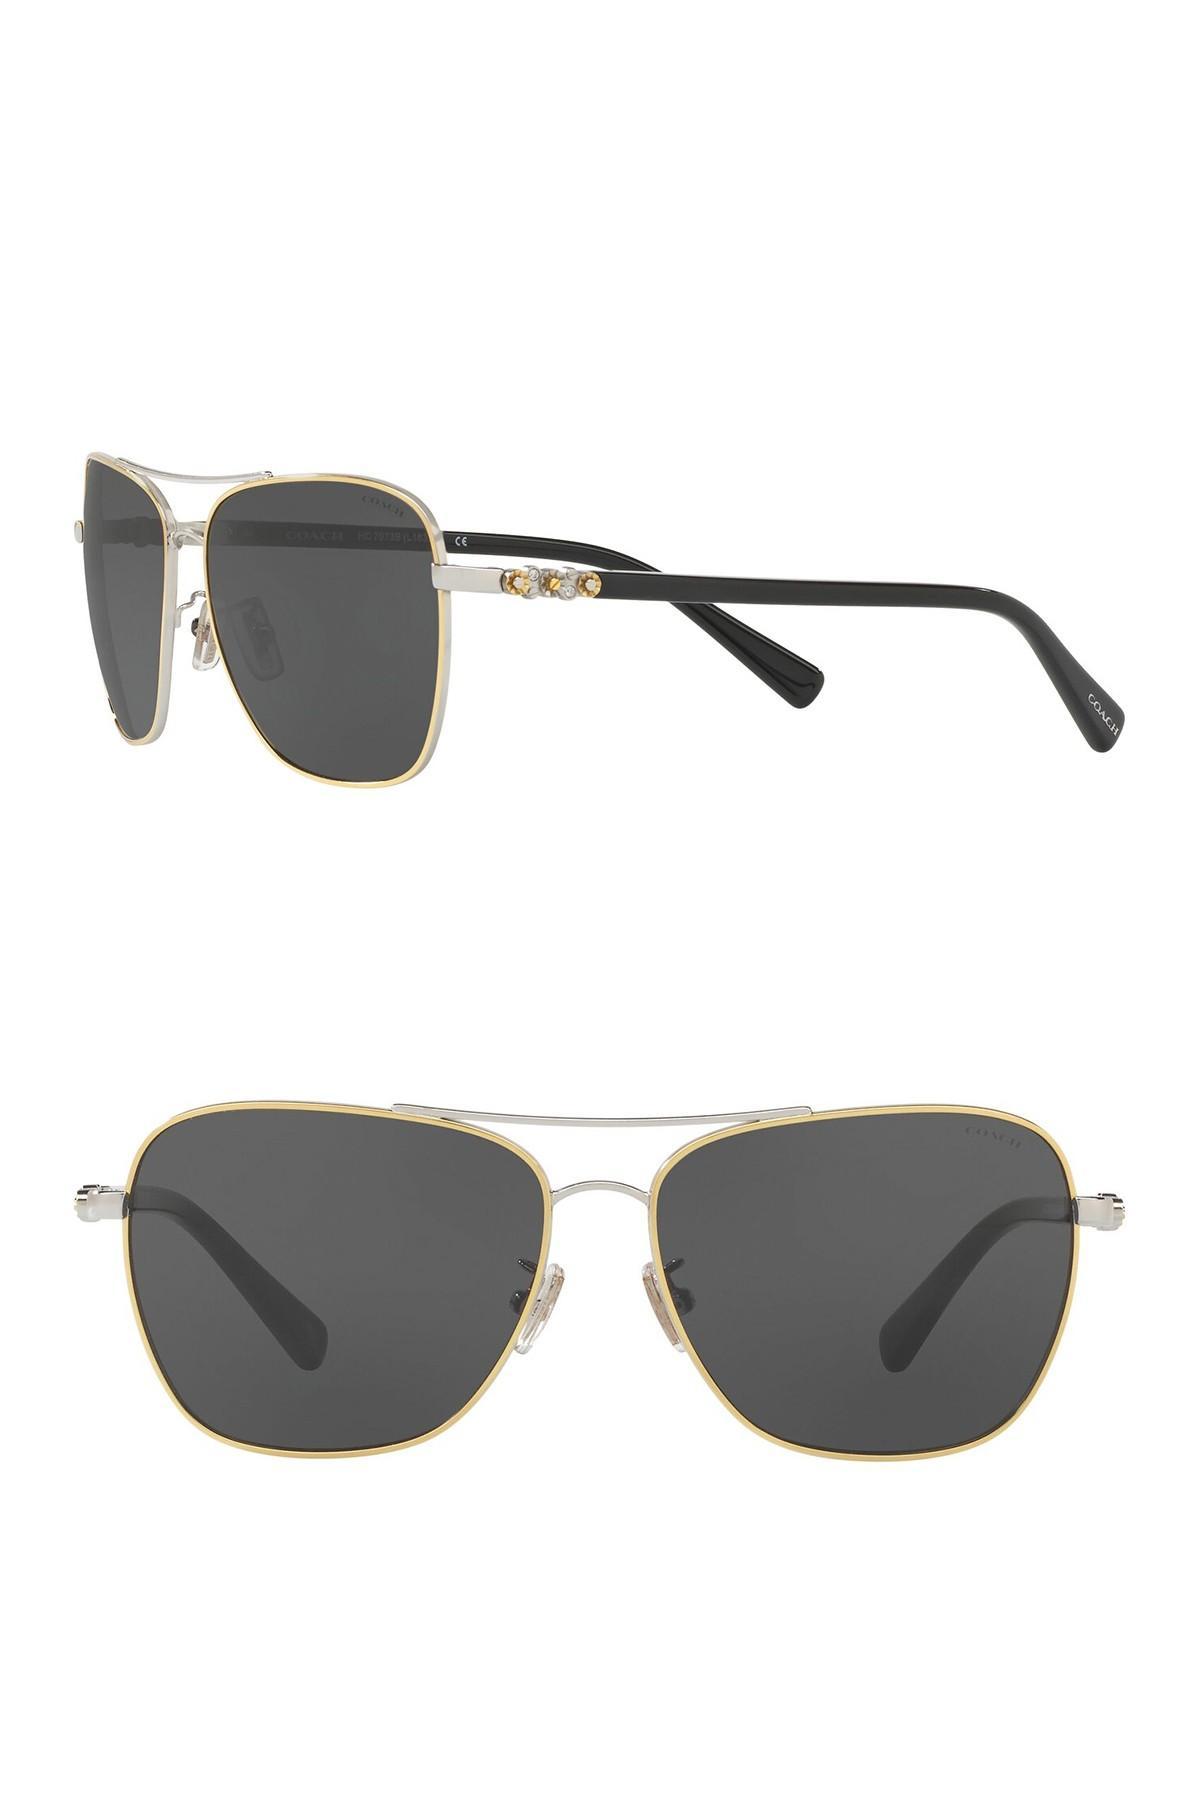 eae41797f8bc COACH. Women's 59mm Uptown Aviator Sunglasses